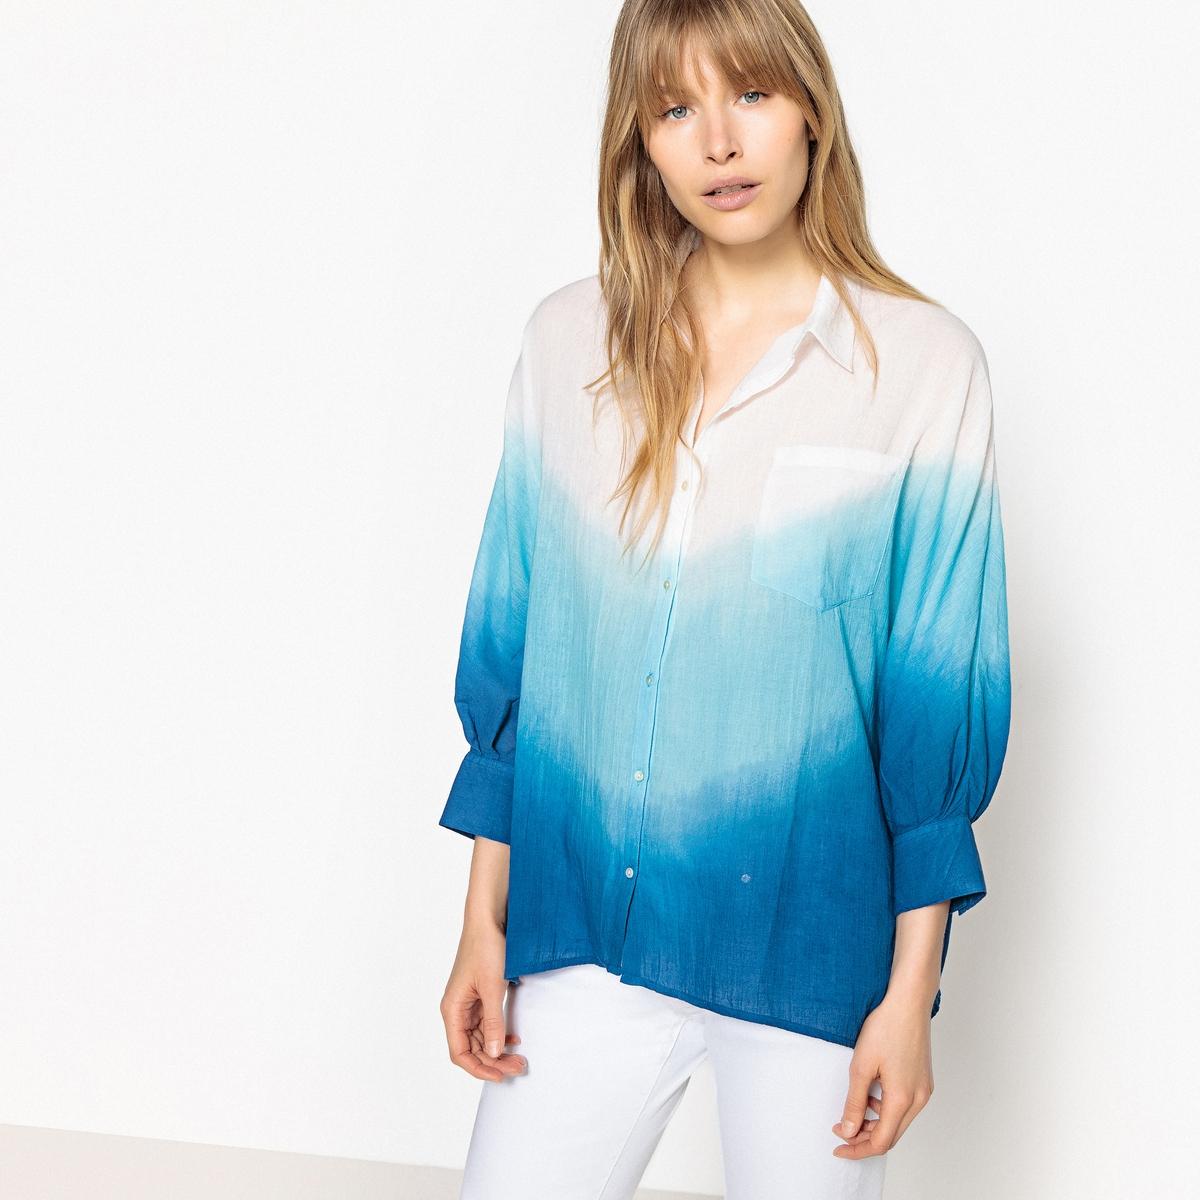 Camisa tye and dye, 100% algodón